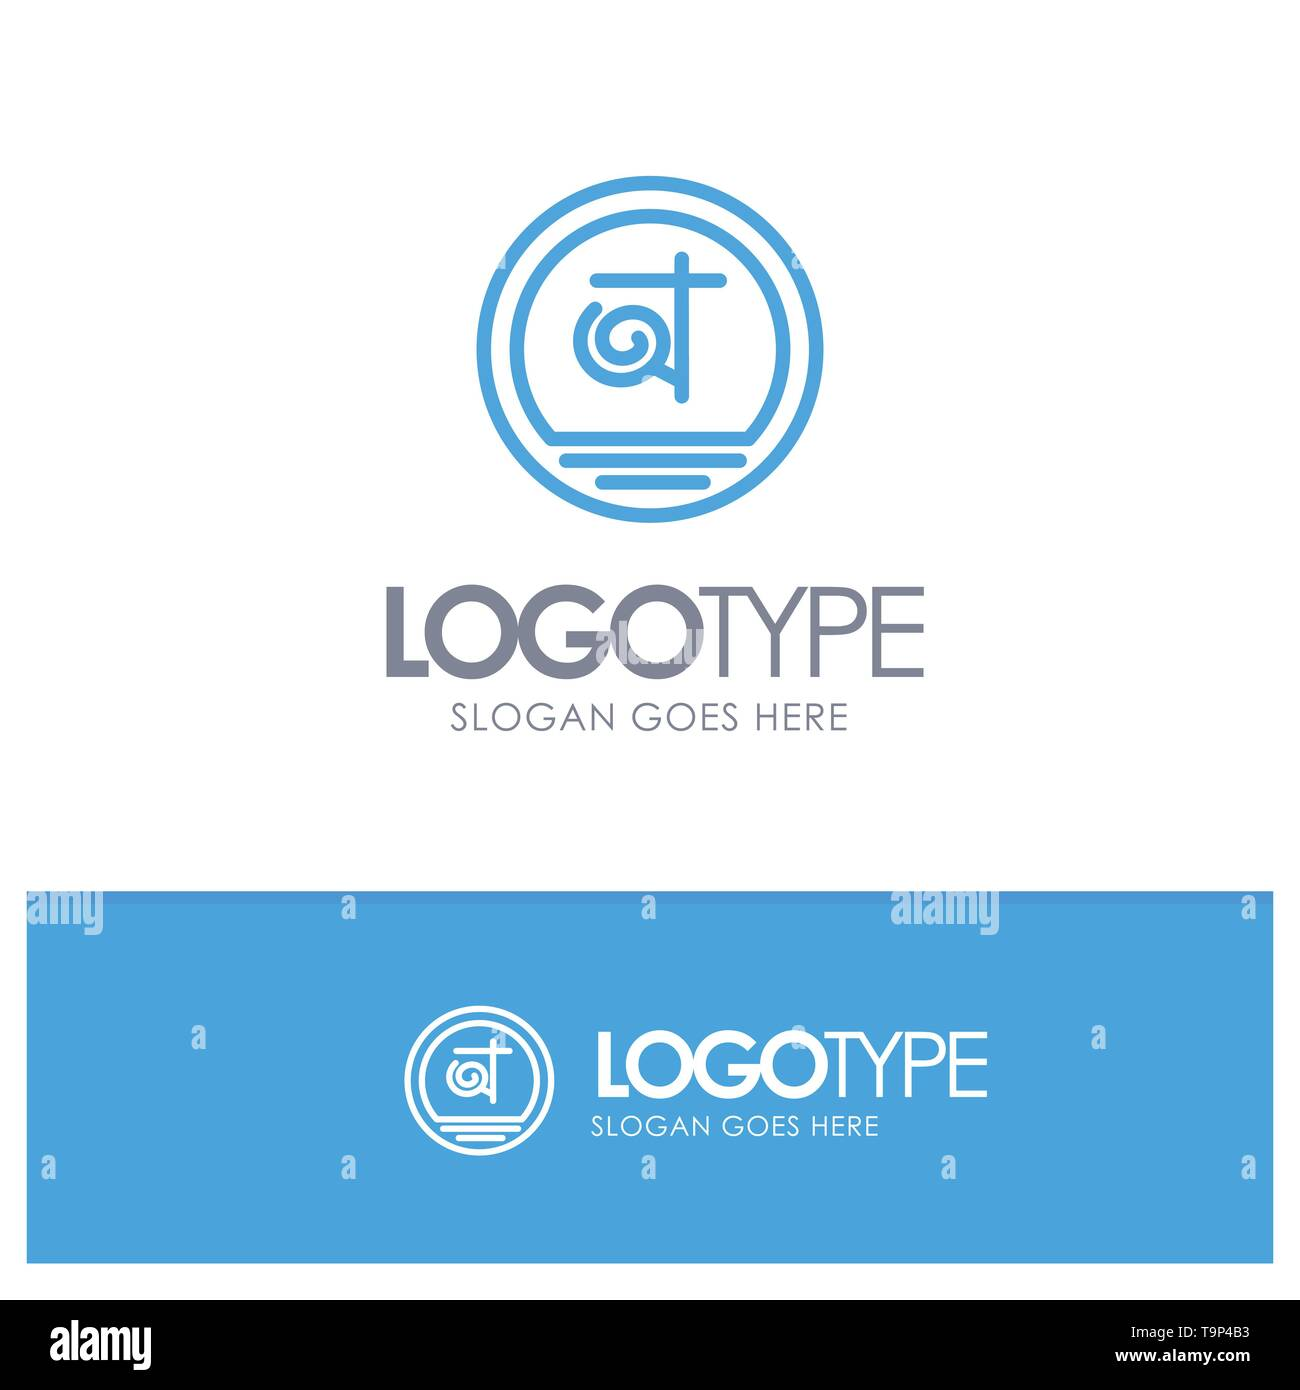 Bangla, Bangladesh, Bangladeshi, Business Blue Outline Logo Place for Tagline - Stock Image